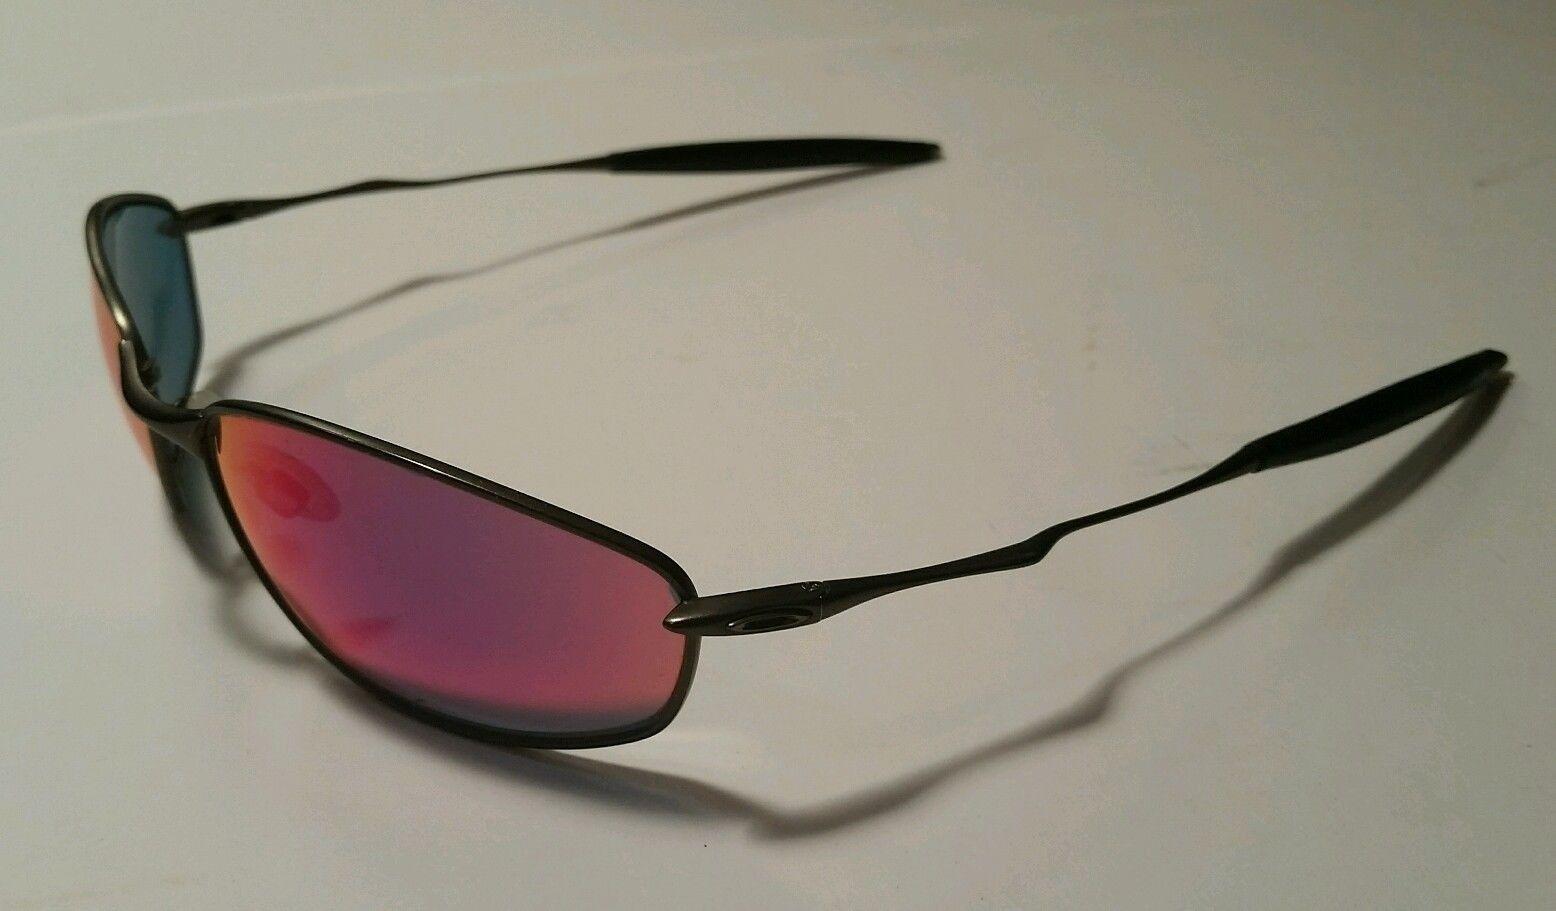 Oakley Whisker titanium with no SKU # - $_57 (1).JPG